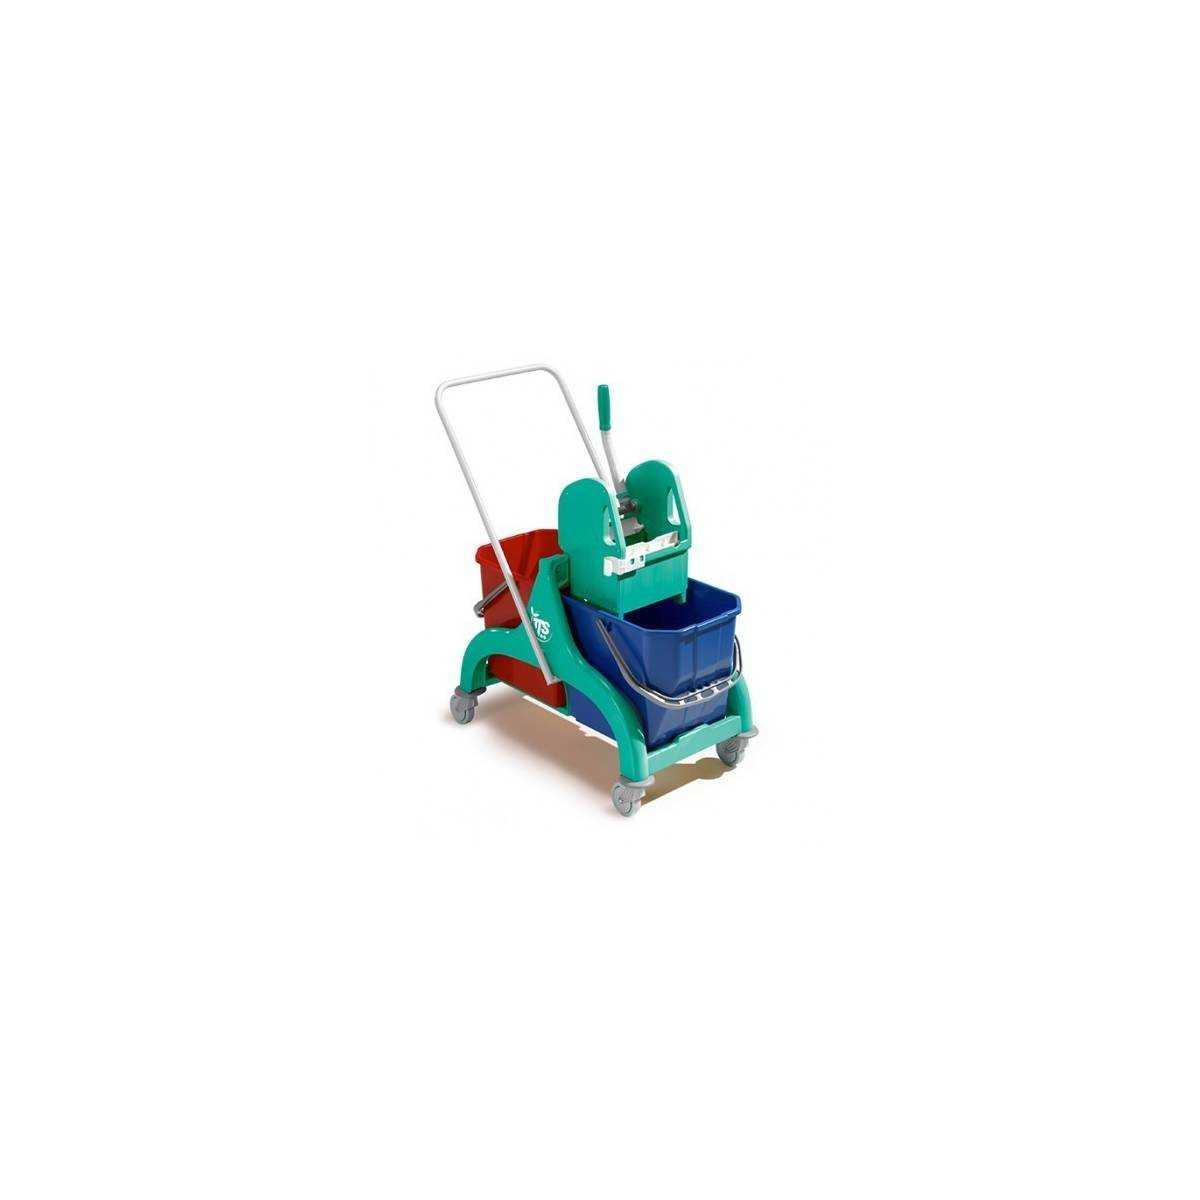 Тележка для уборки Nick 50L (6088) 6088 TTS